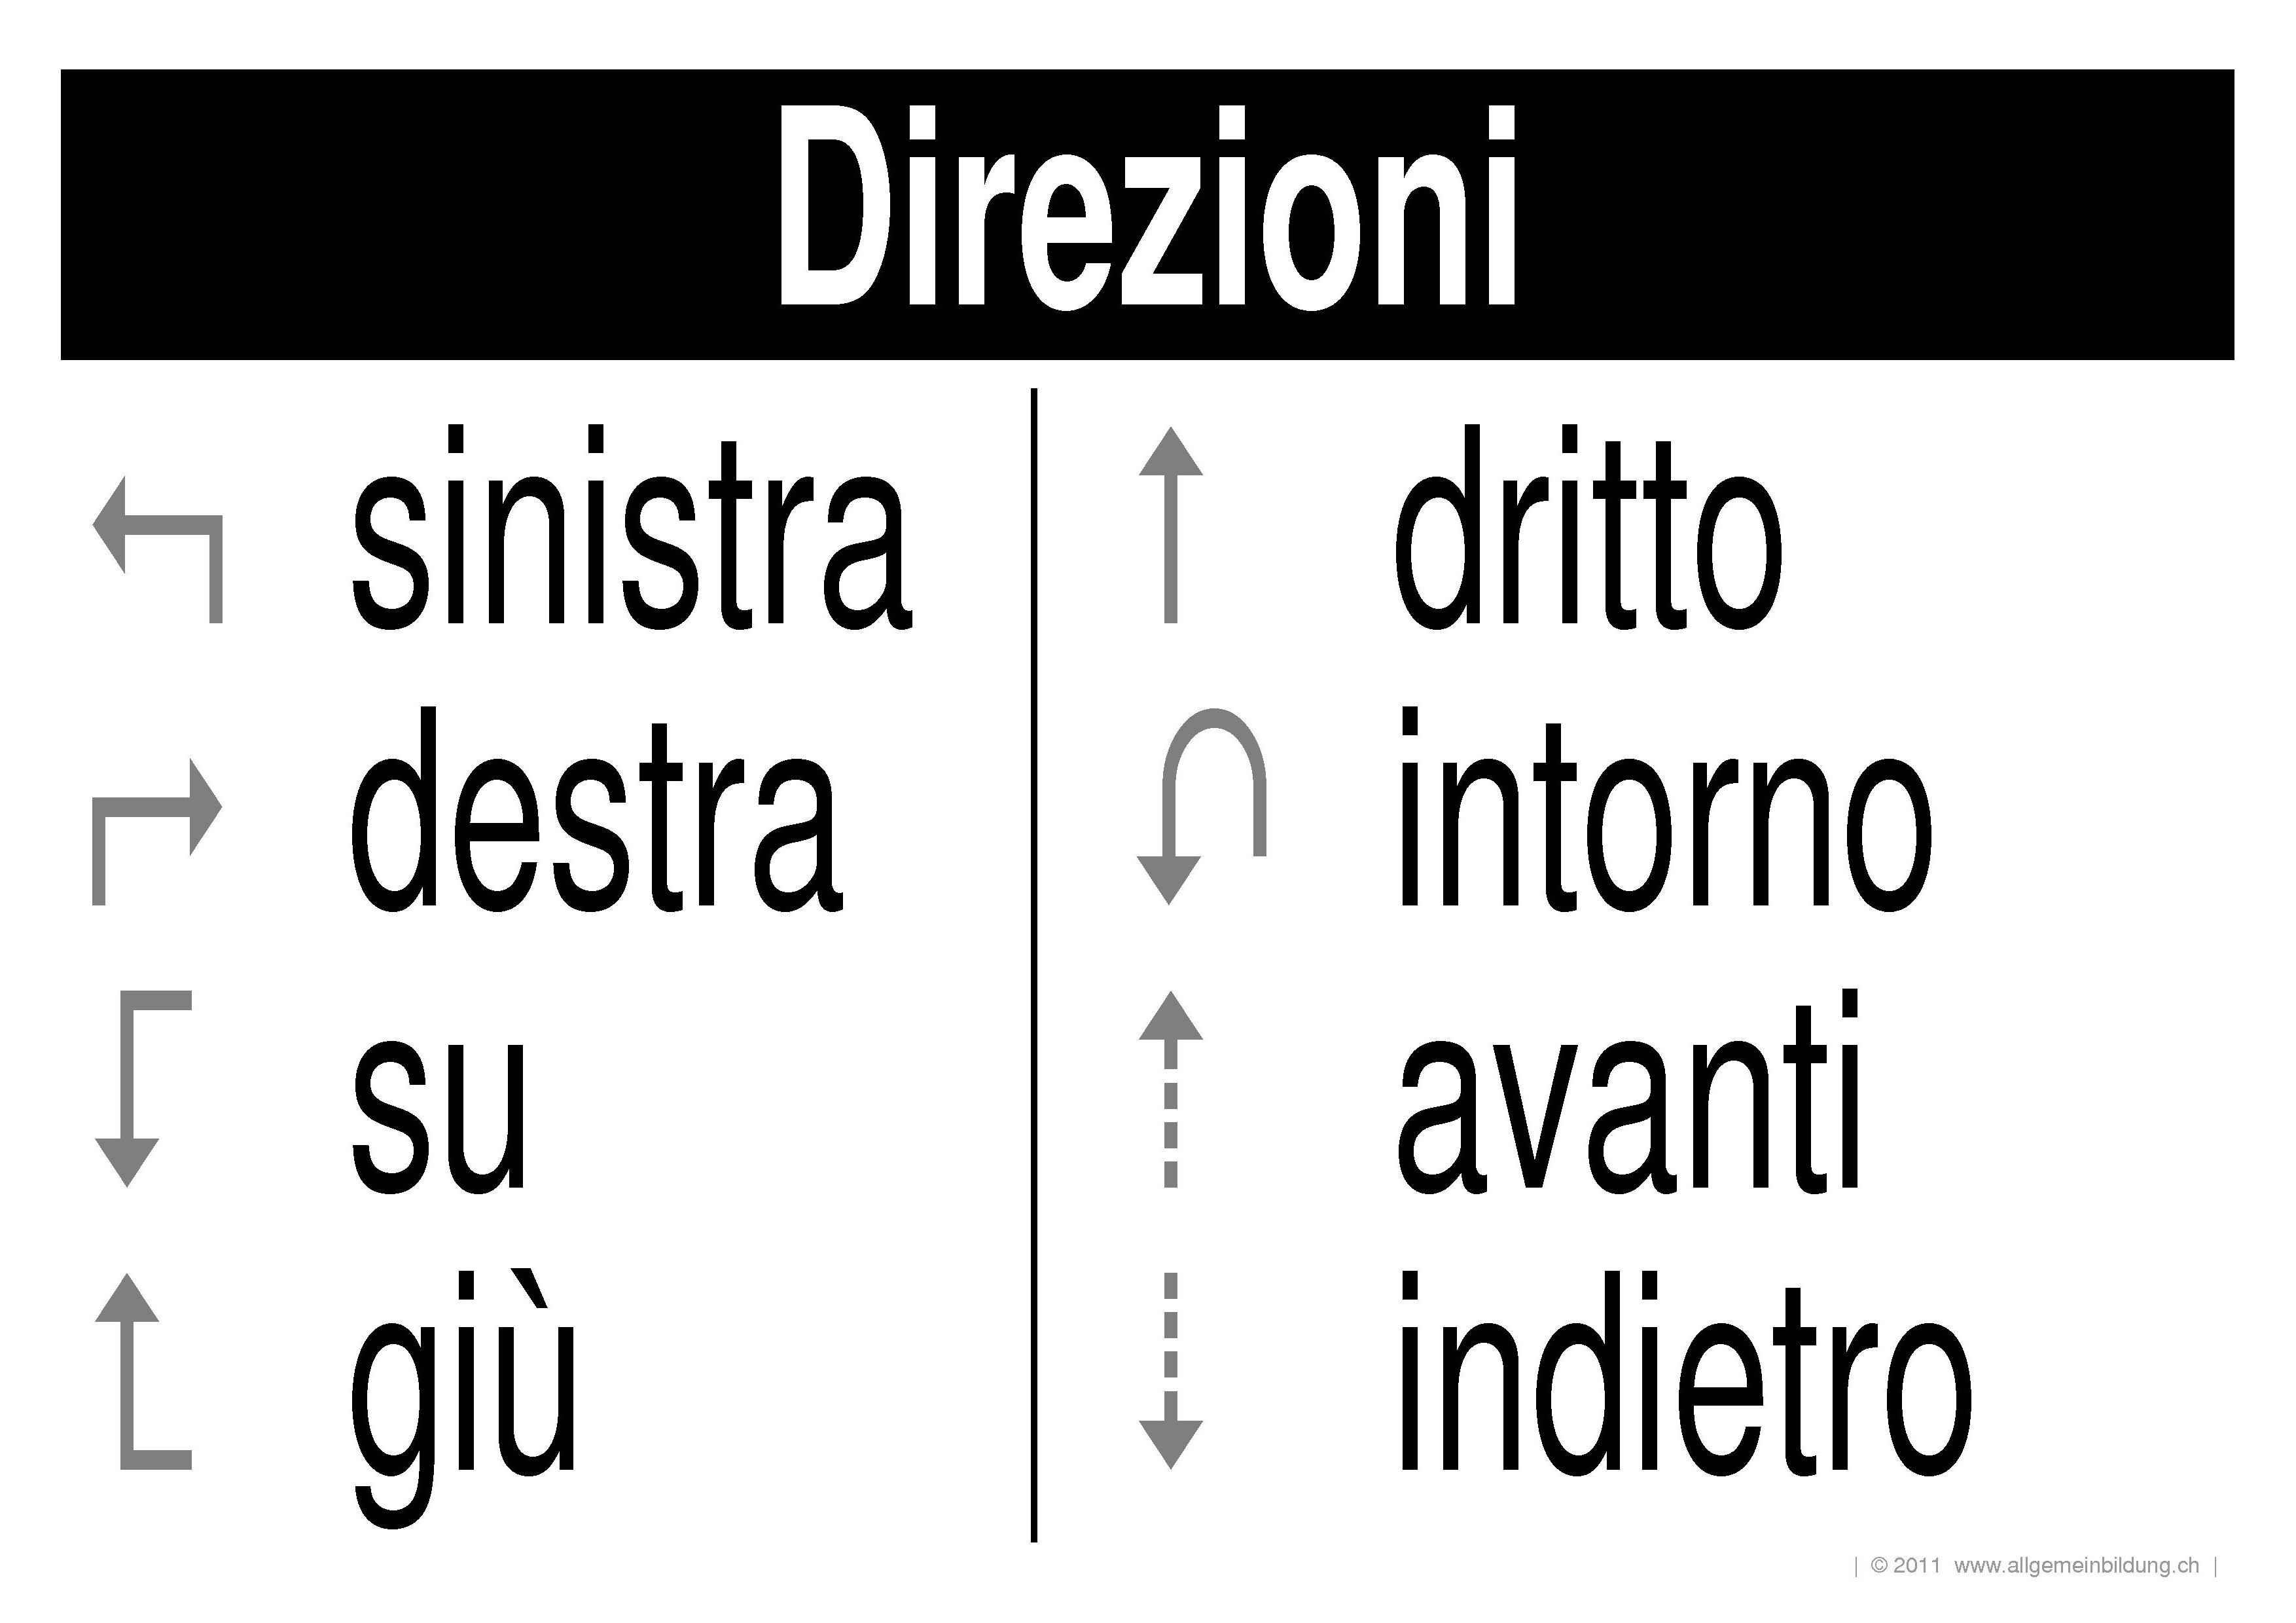 italienisch lernplakate wissensposter direzioni 8500 bungen arbeitsbl tter r tsel quiz. Black Bedroom Furniture Sets. Home Design Ideas